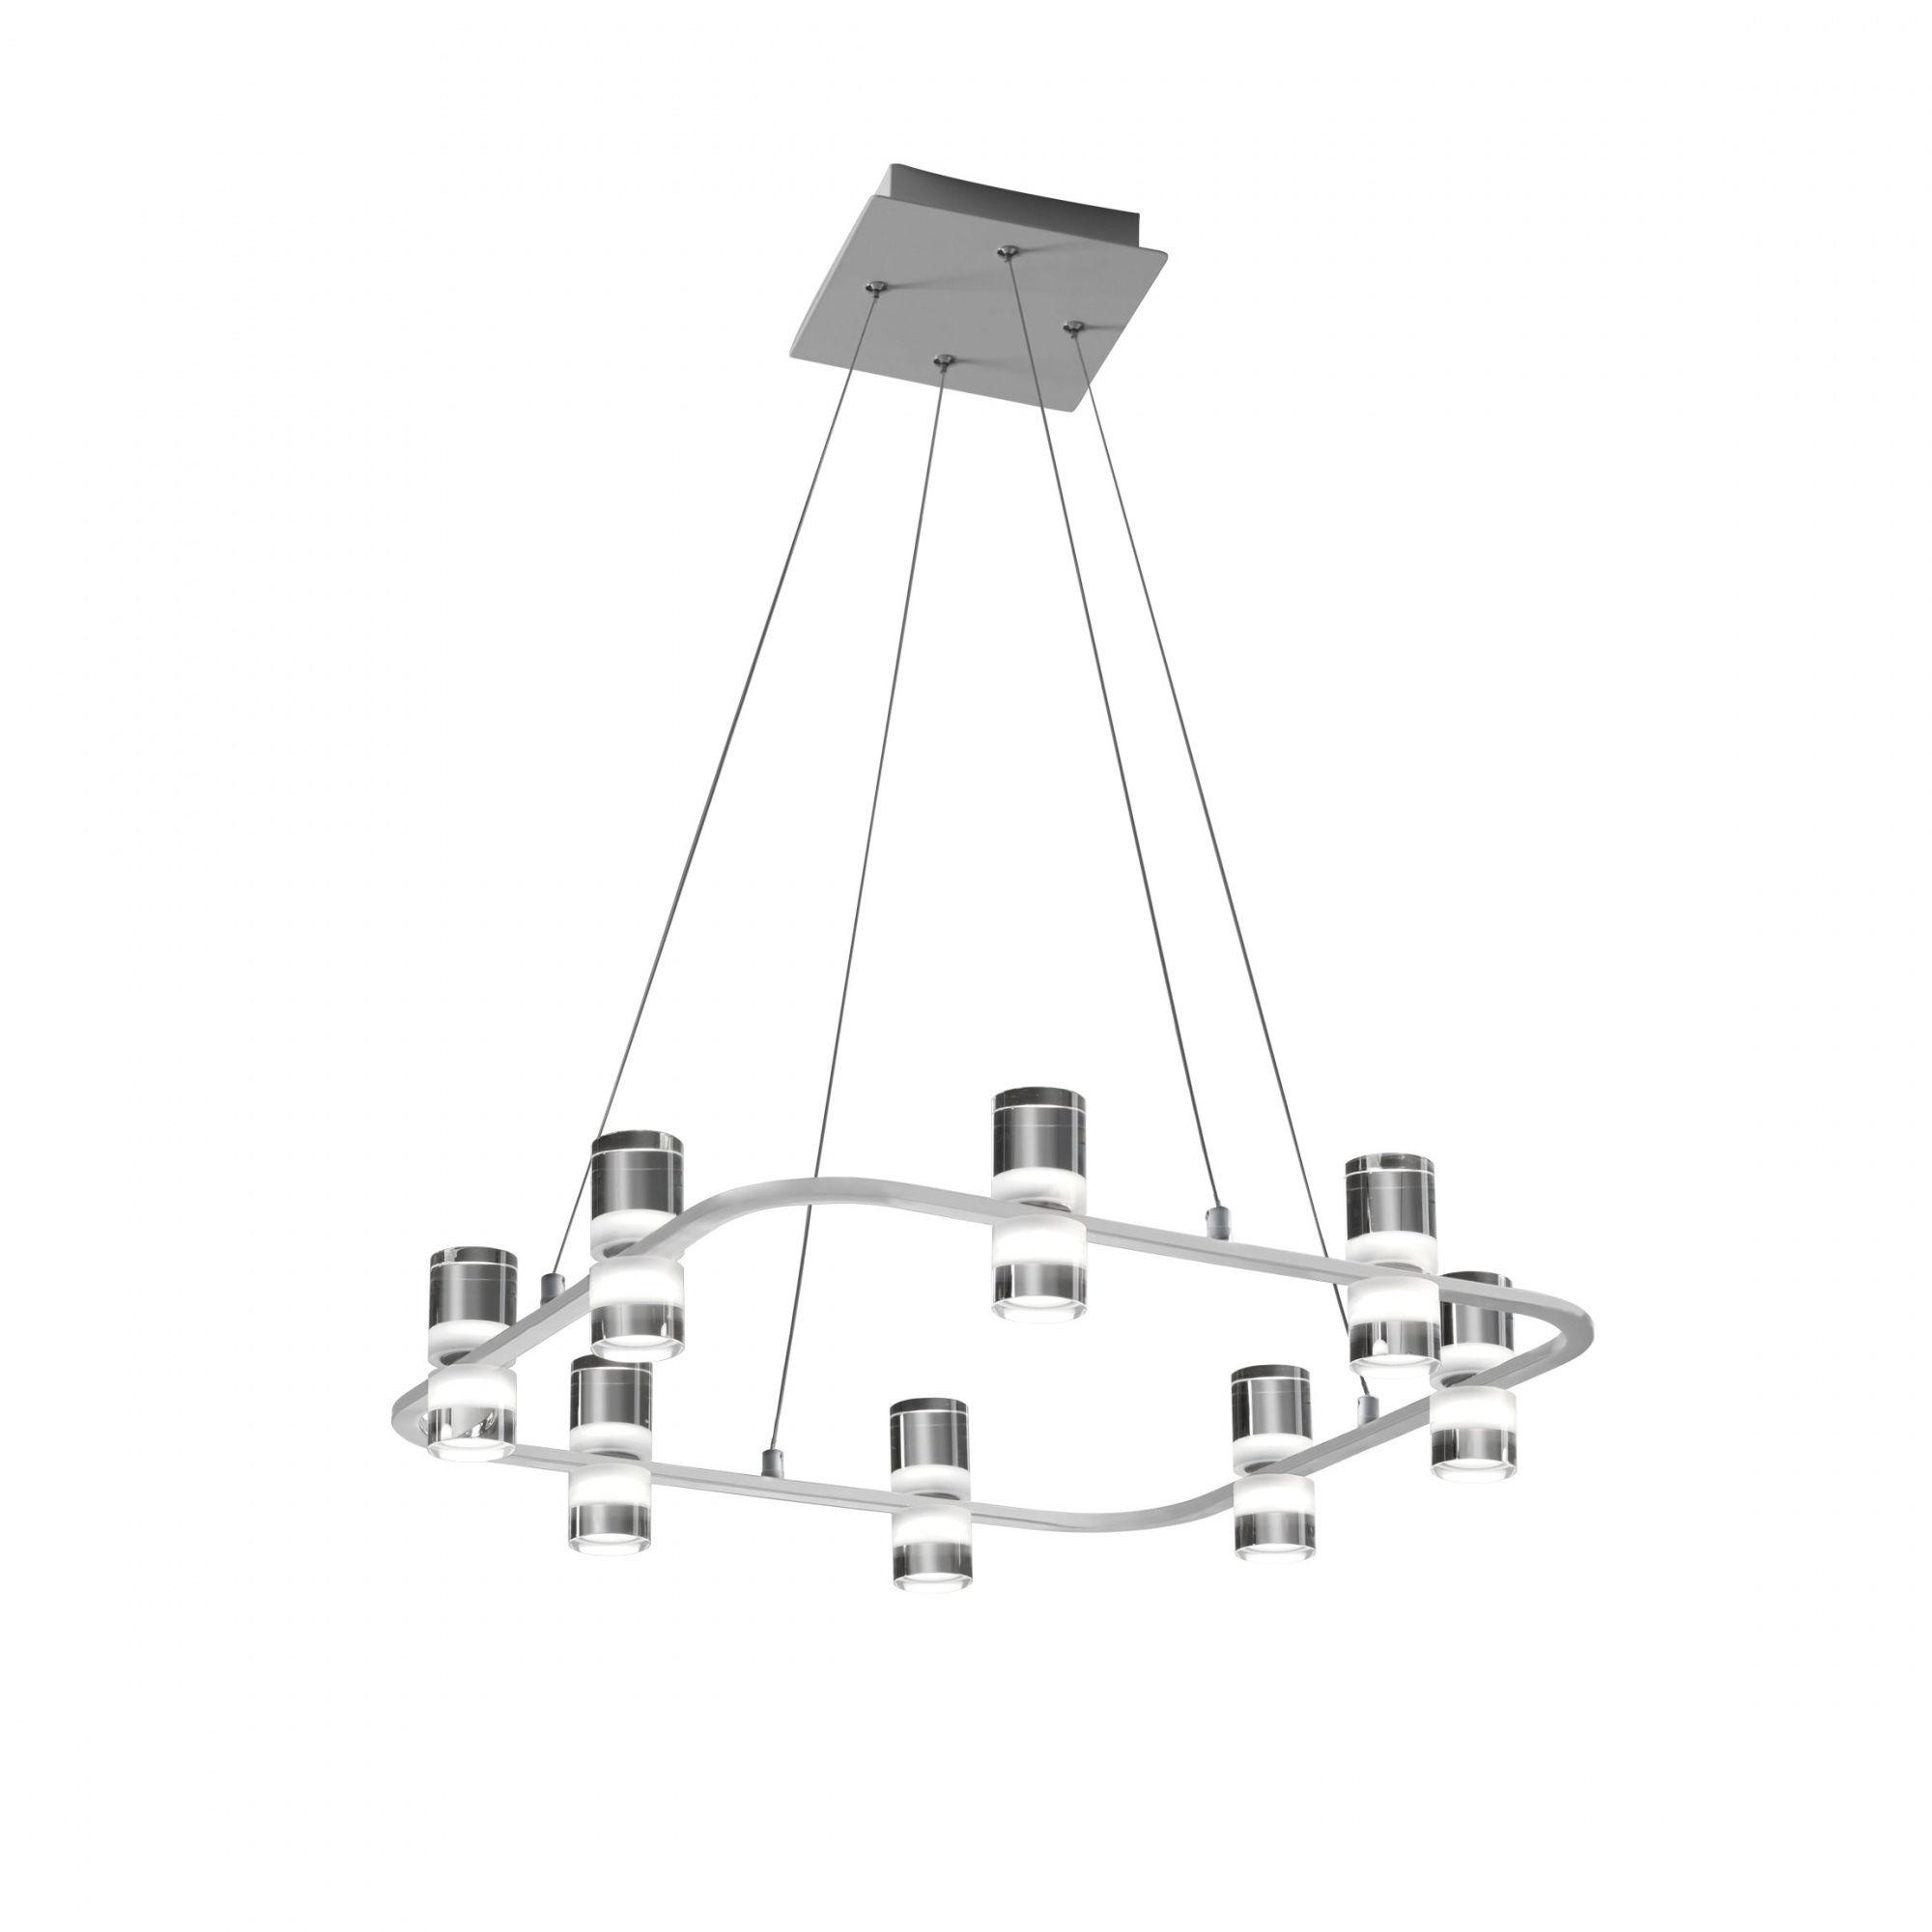 Lampa wisząca Kingfort 0085.30.BI VIVIDA International efektowna lampa wisząca biała LED 8 kloszy